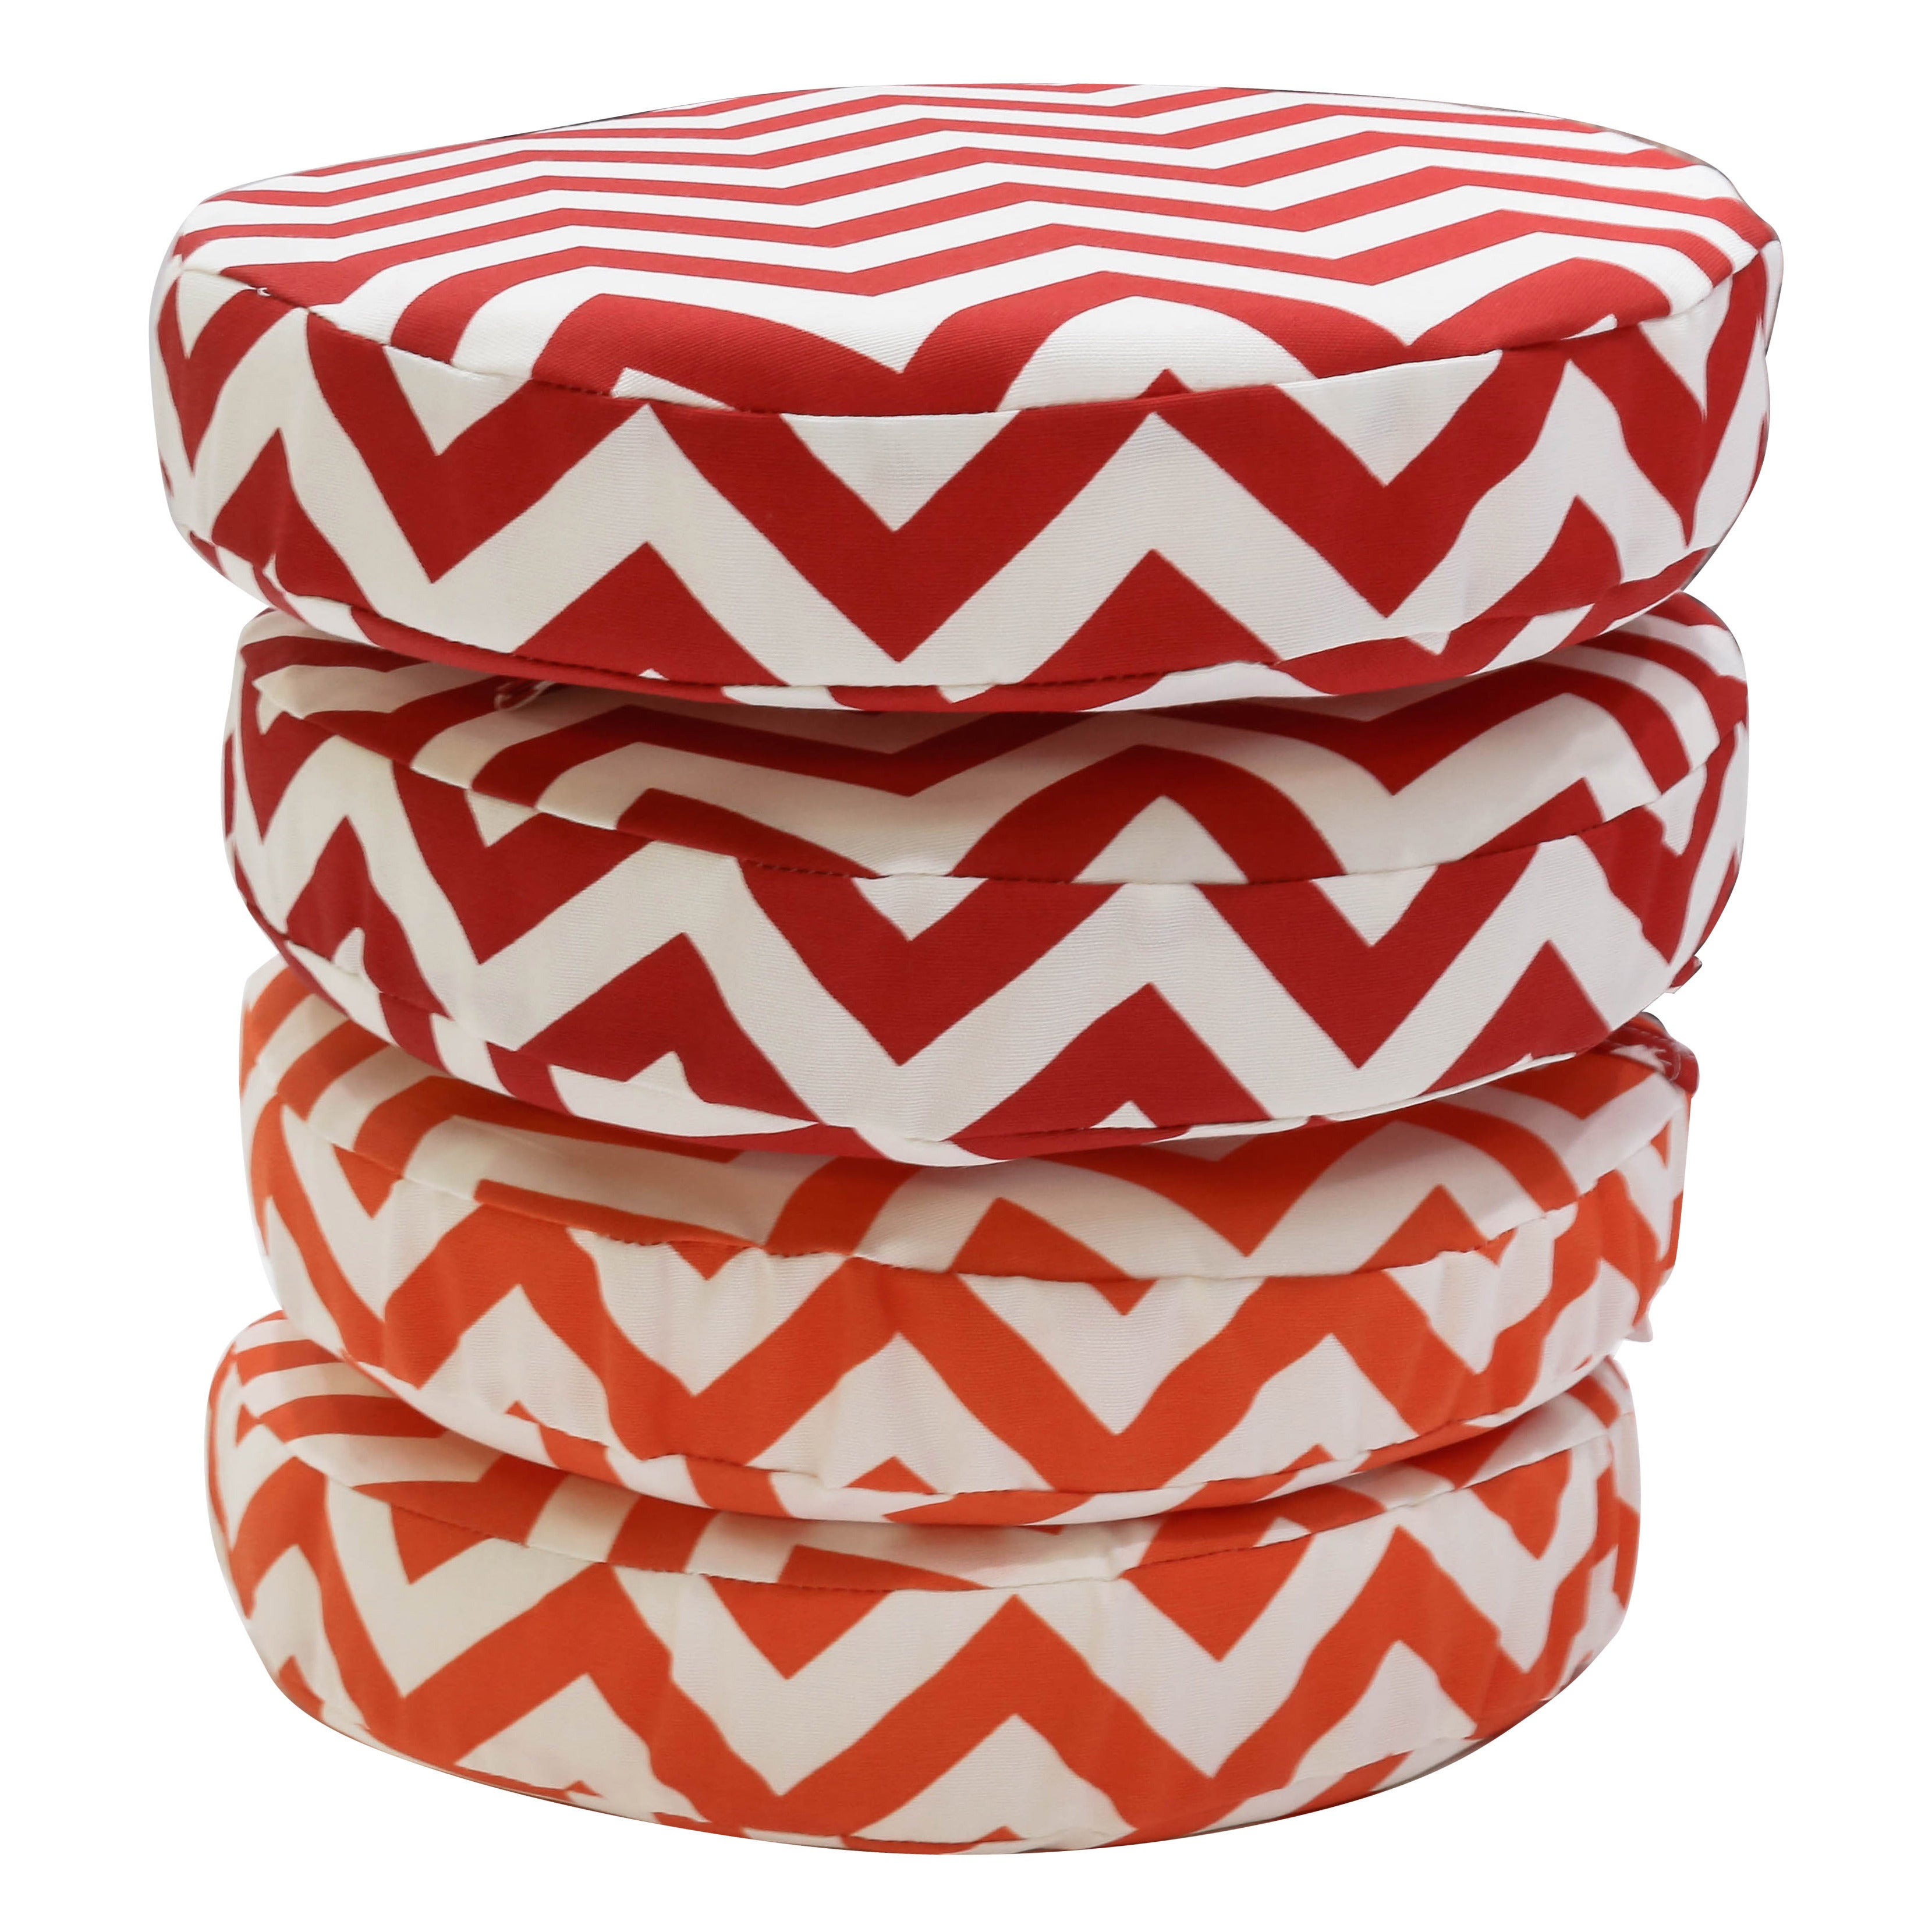 Shop Black Friday Deals On Somette Chevron 14 Inch Round Bistro Cushions Set Of 2 Overstock 10059228